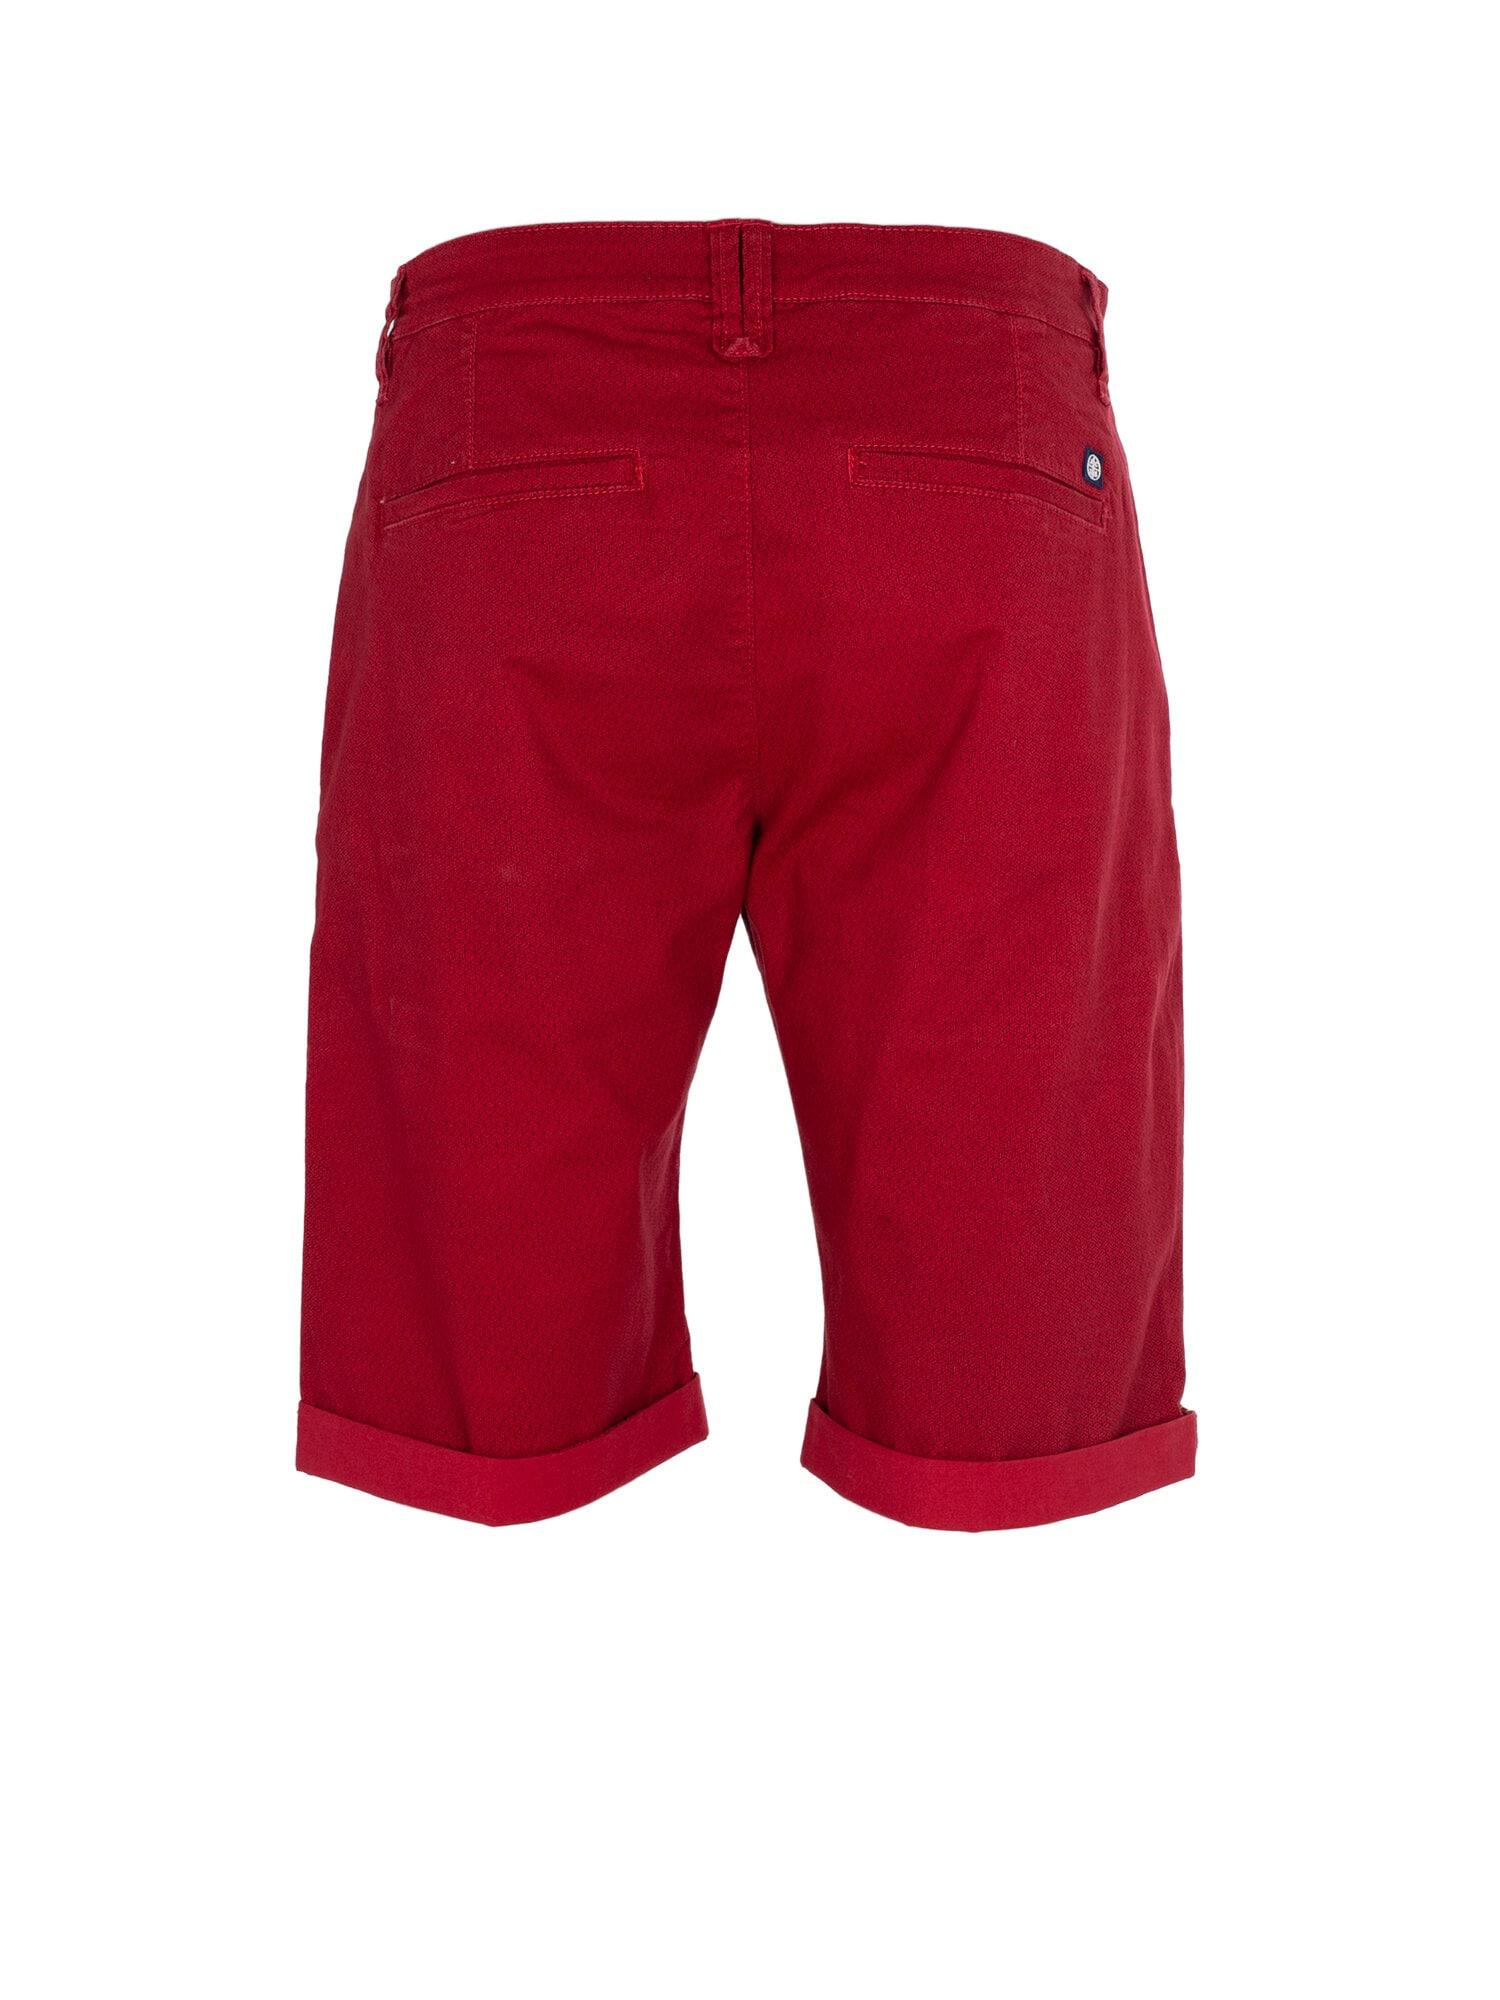 Print Shorts - Lt Red